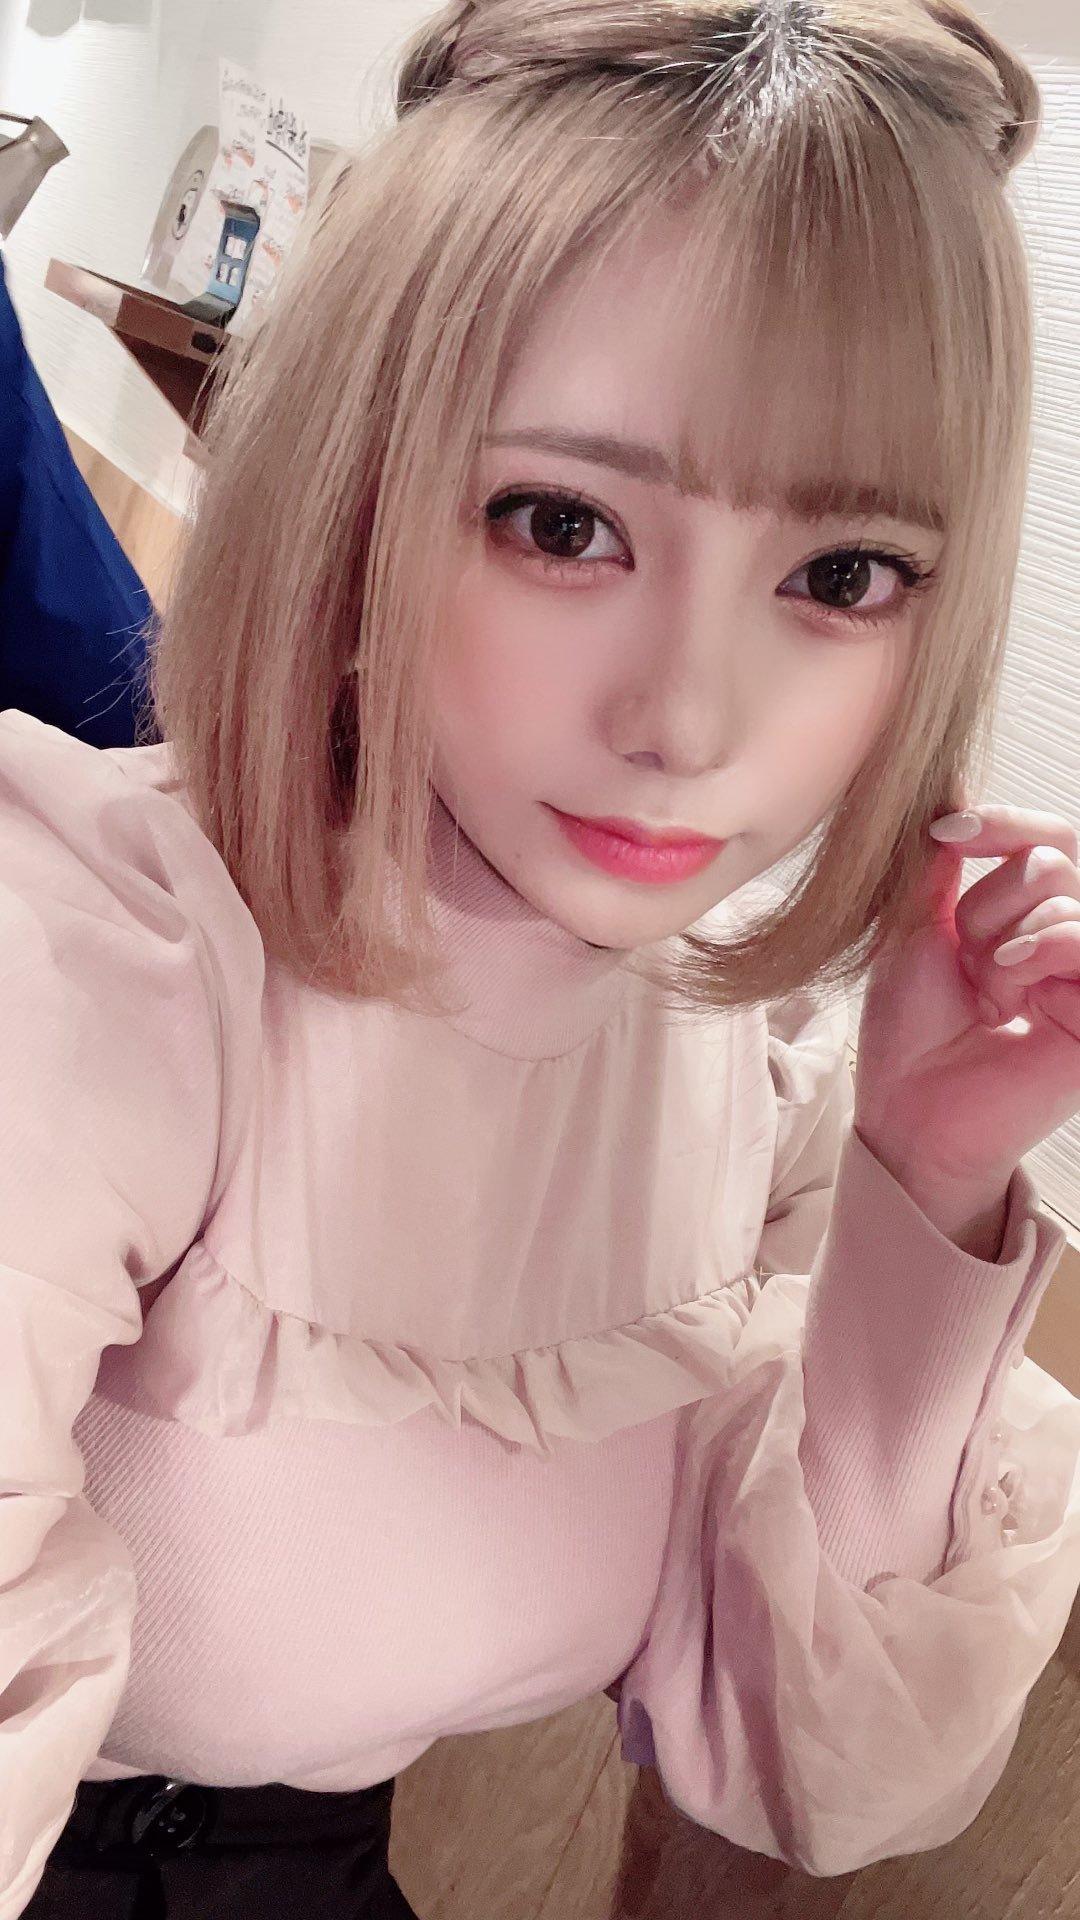 梦见露(梦见るぅ,Yumemi-Roo)近期生活组图及近况介绍 雨后故事 第3张